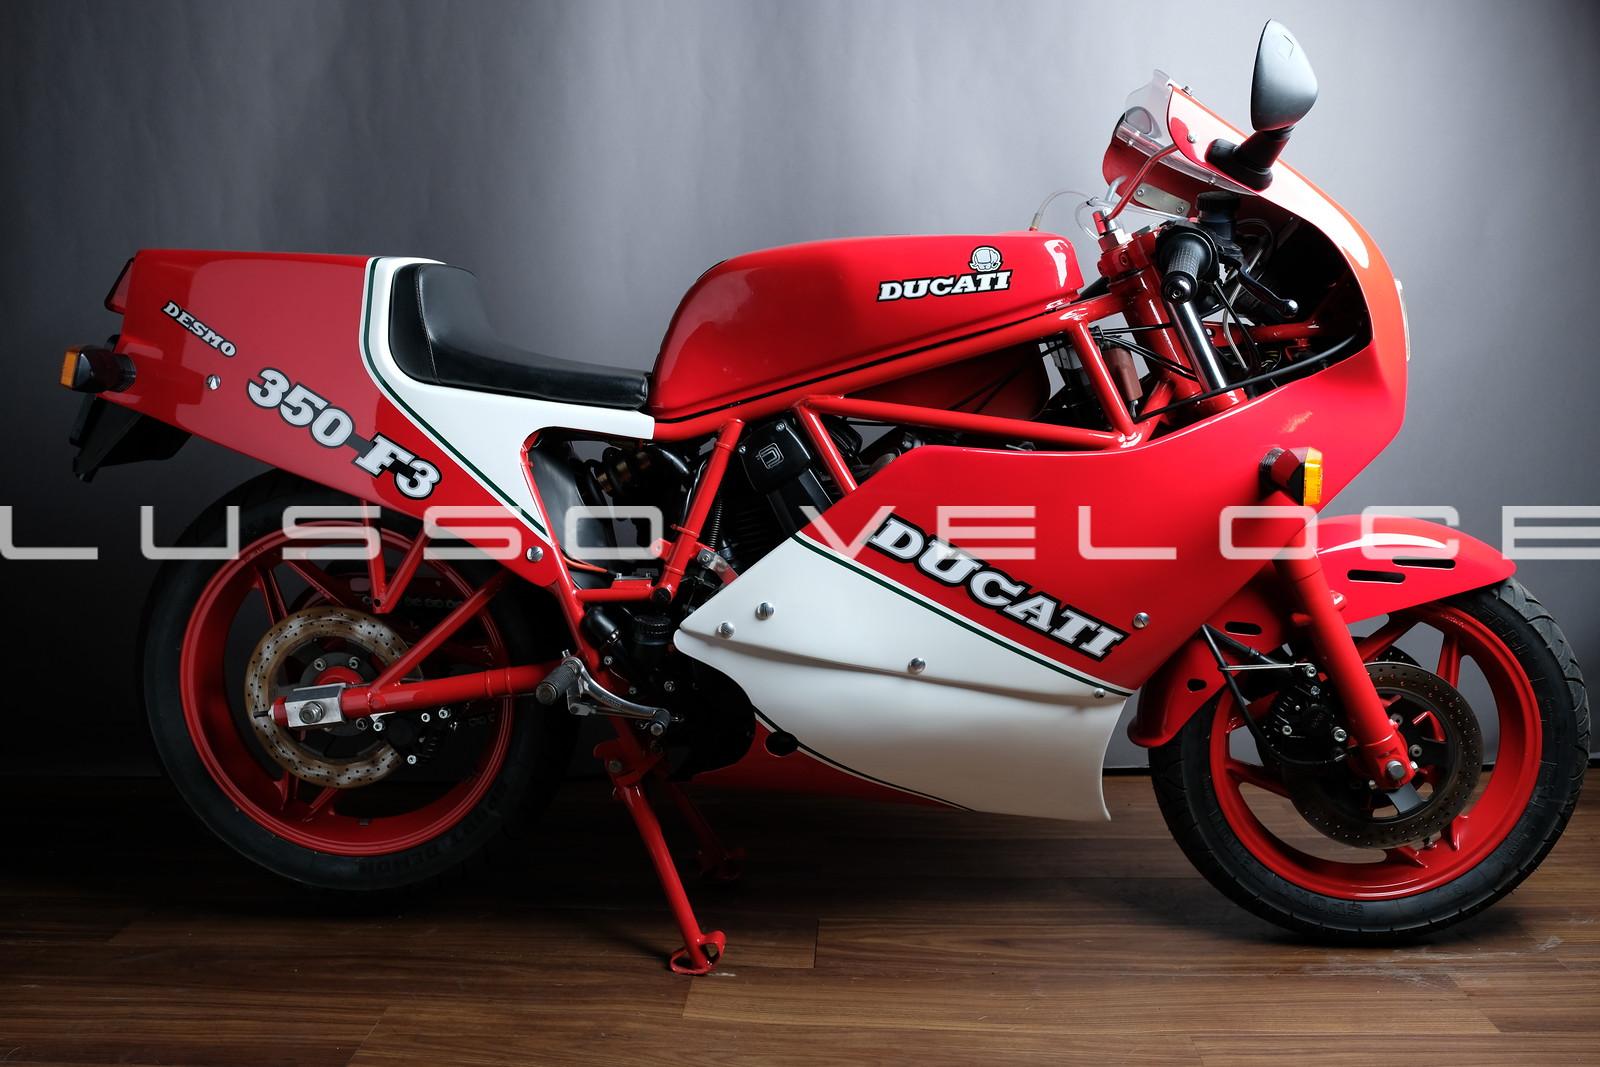 Ducati F3 350